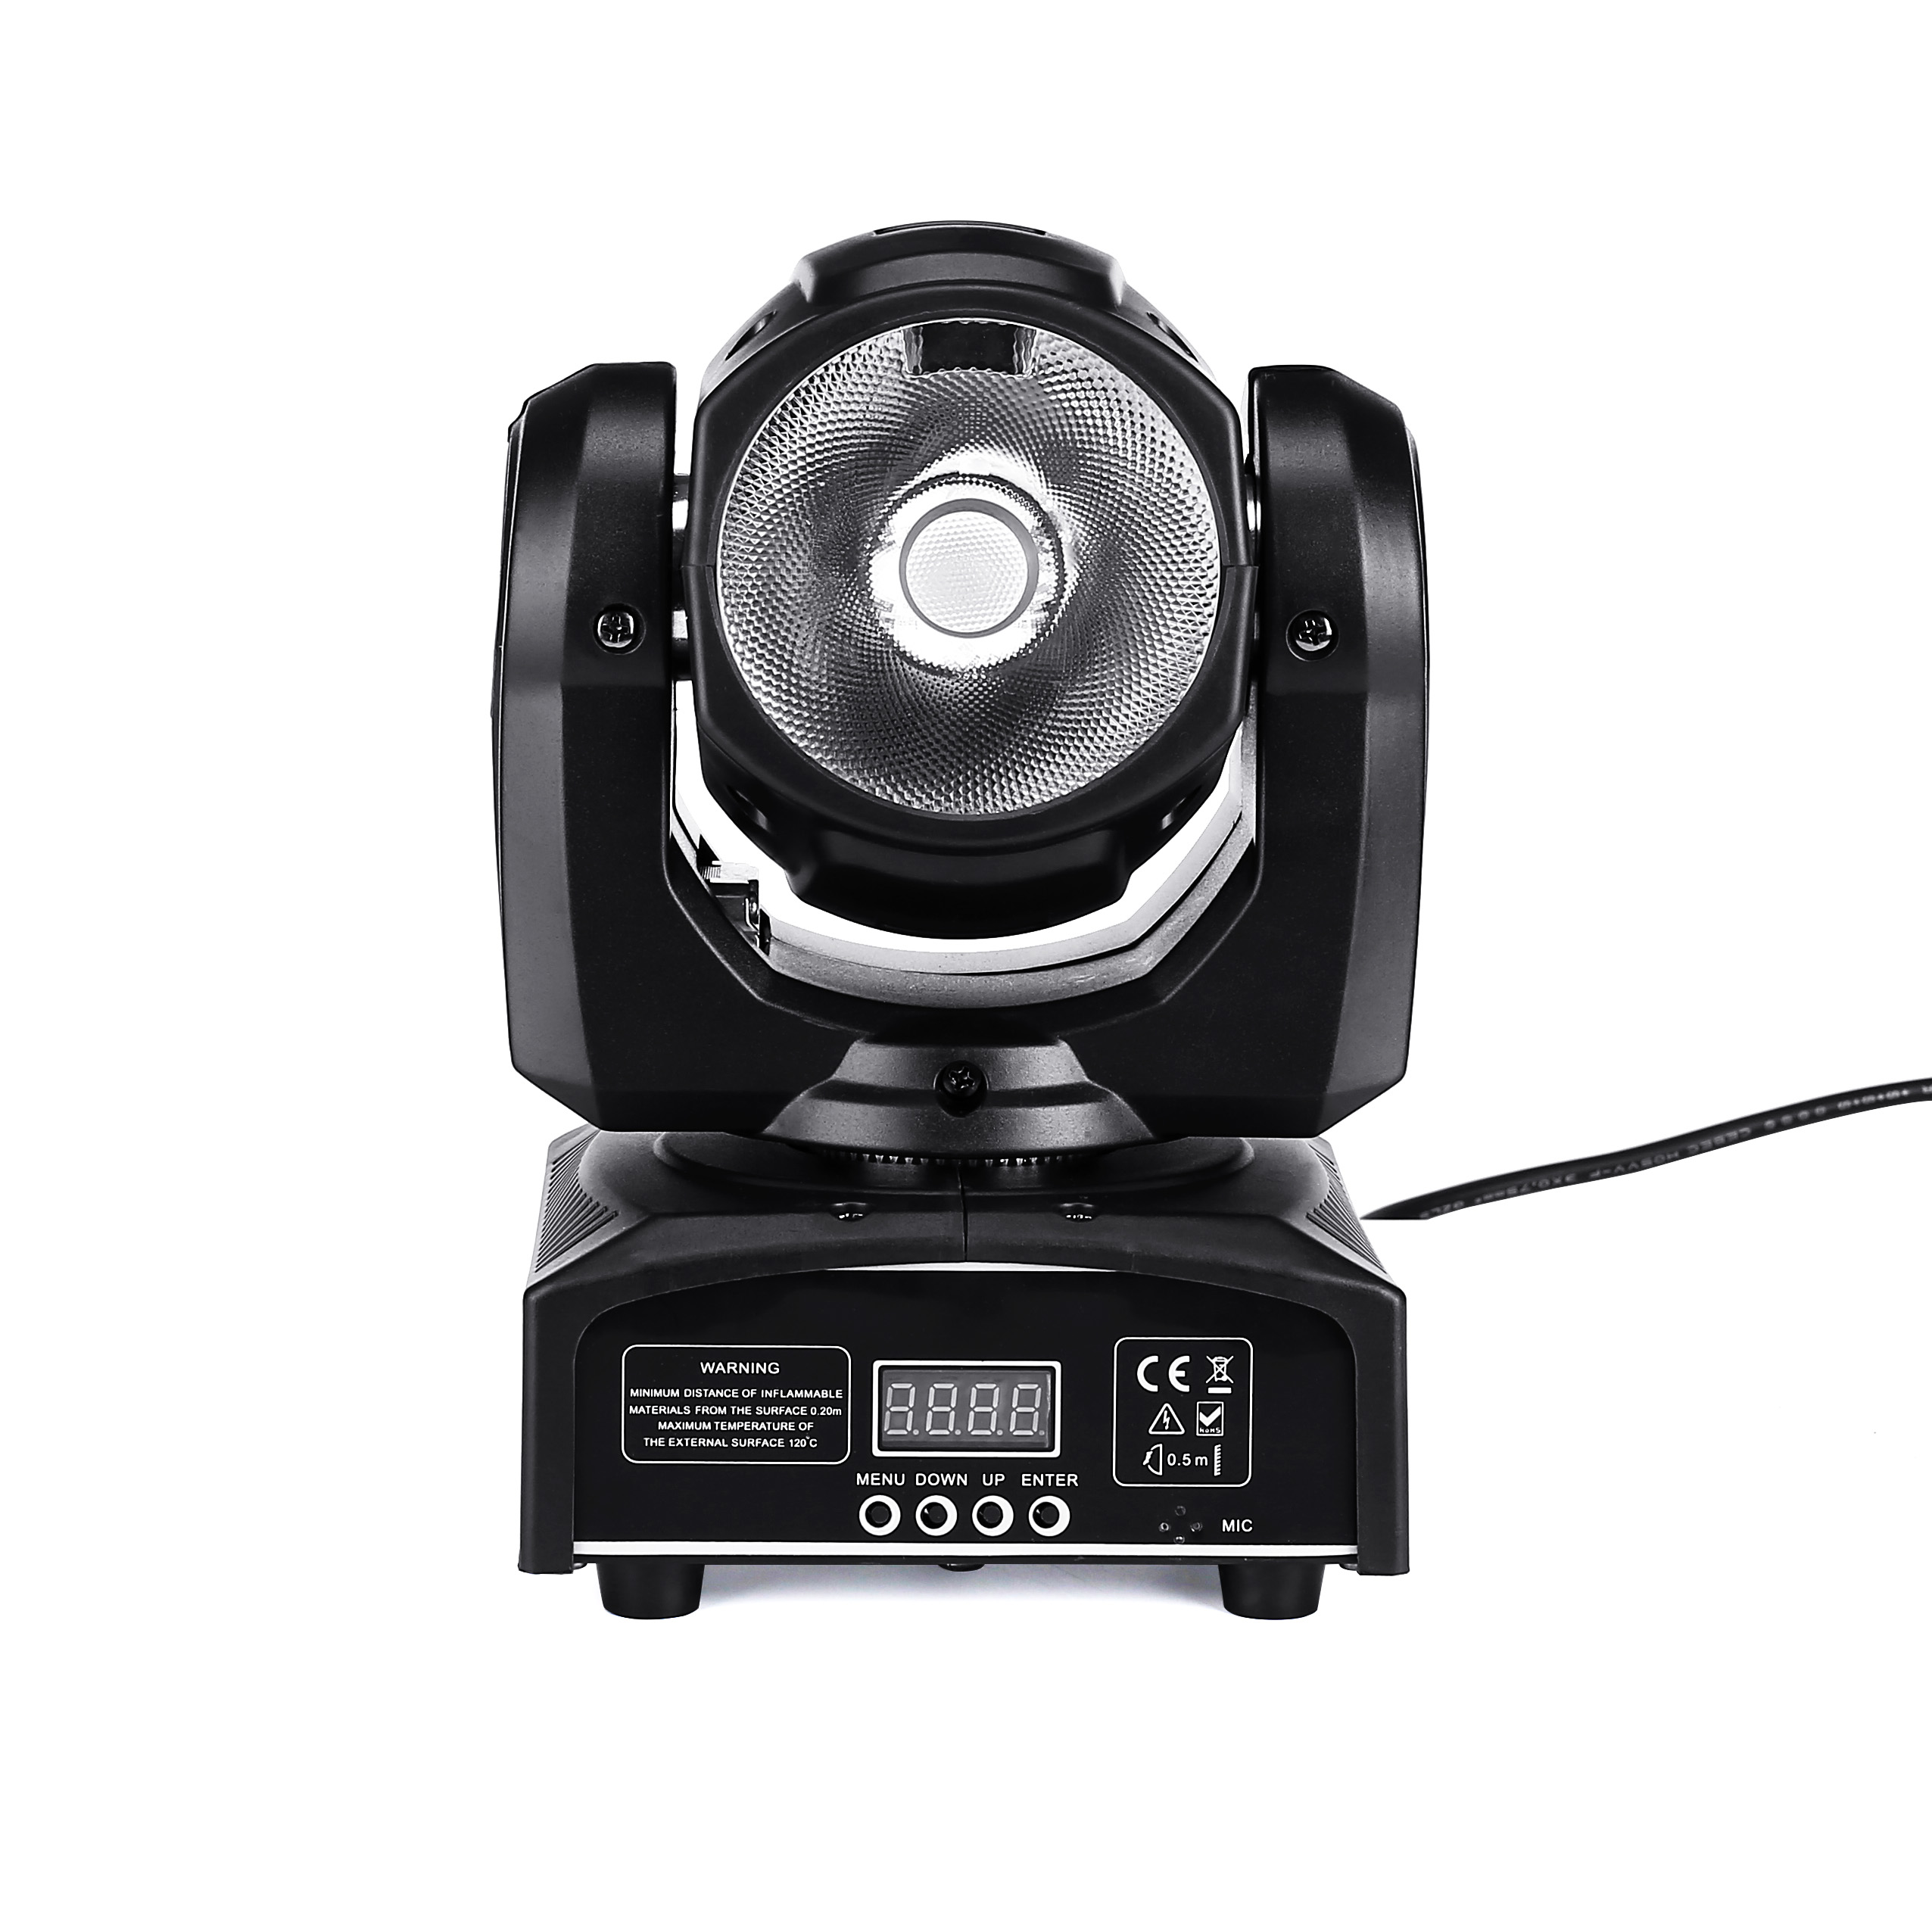 65W Led RGBW 4in1 Beam Moving Head Light 60W Beam Moving Heads Lights Super Bright LED DJ Spot Light Dmx Control Lights